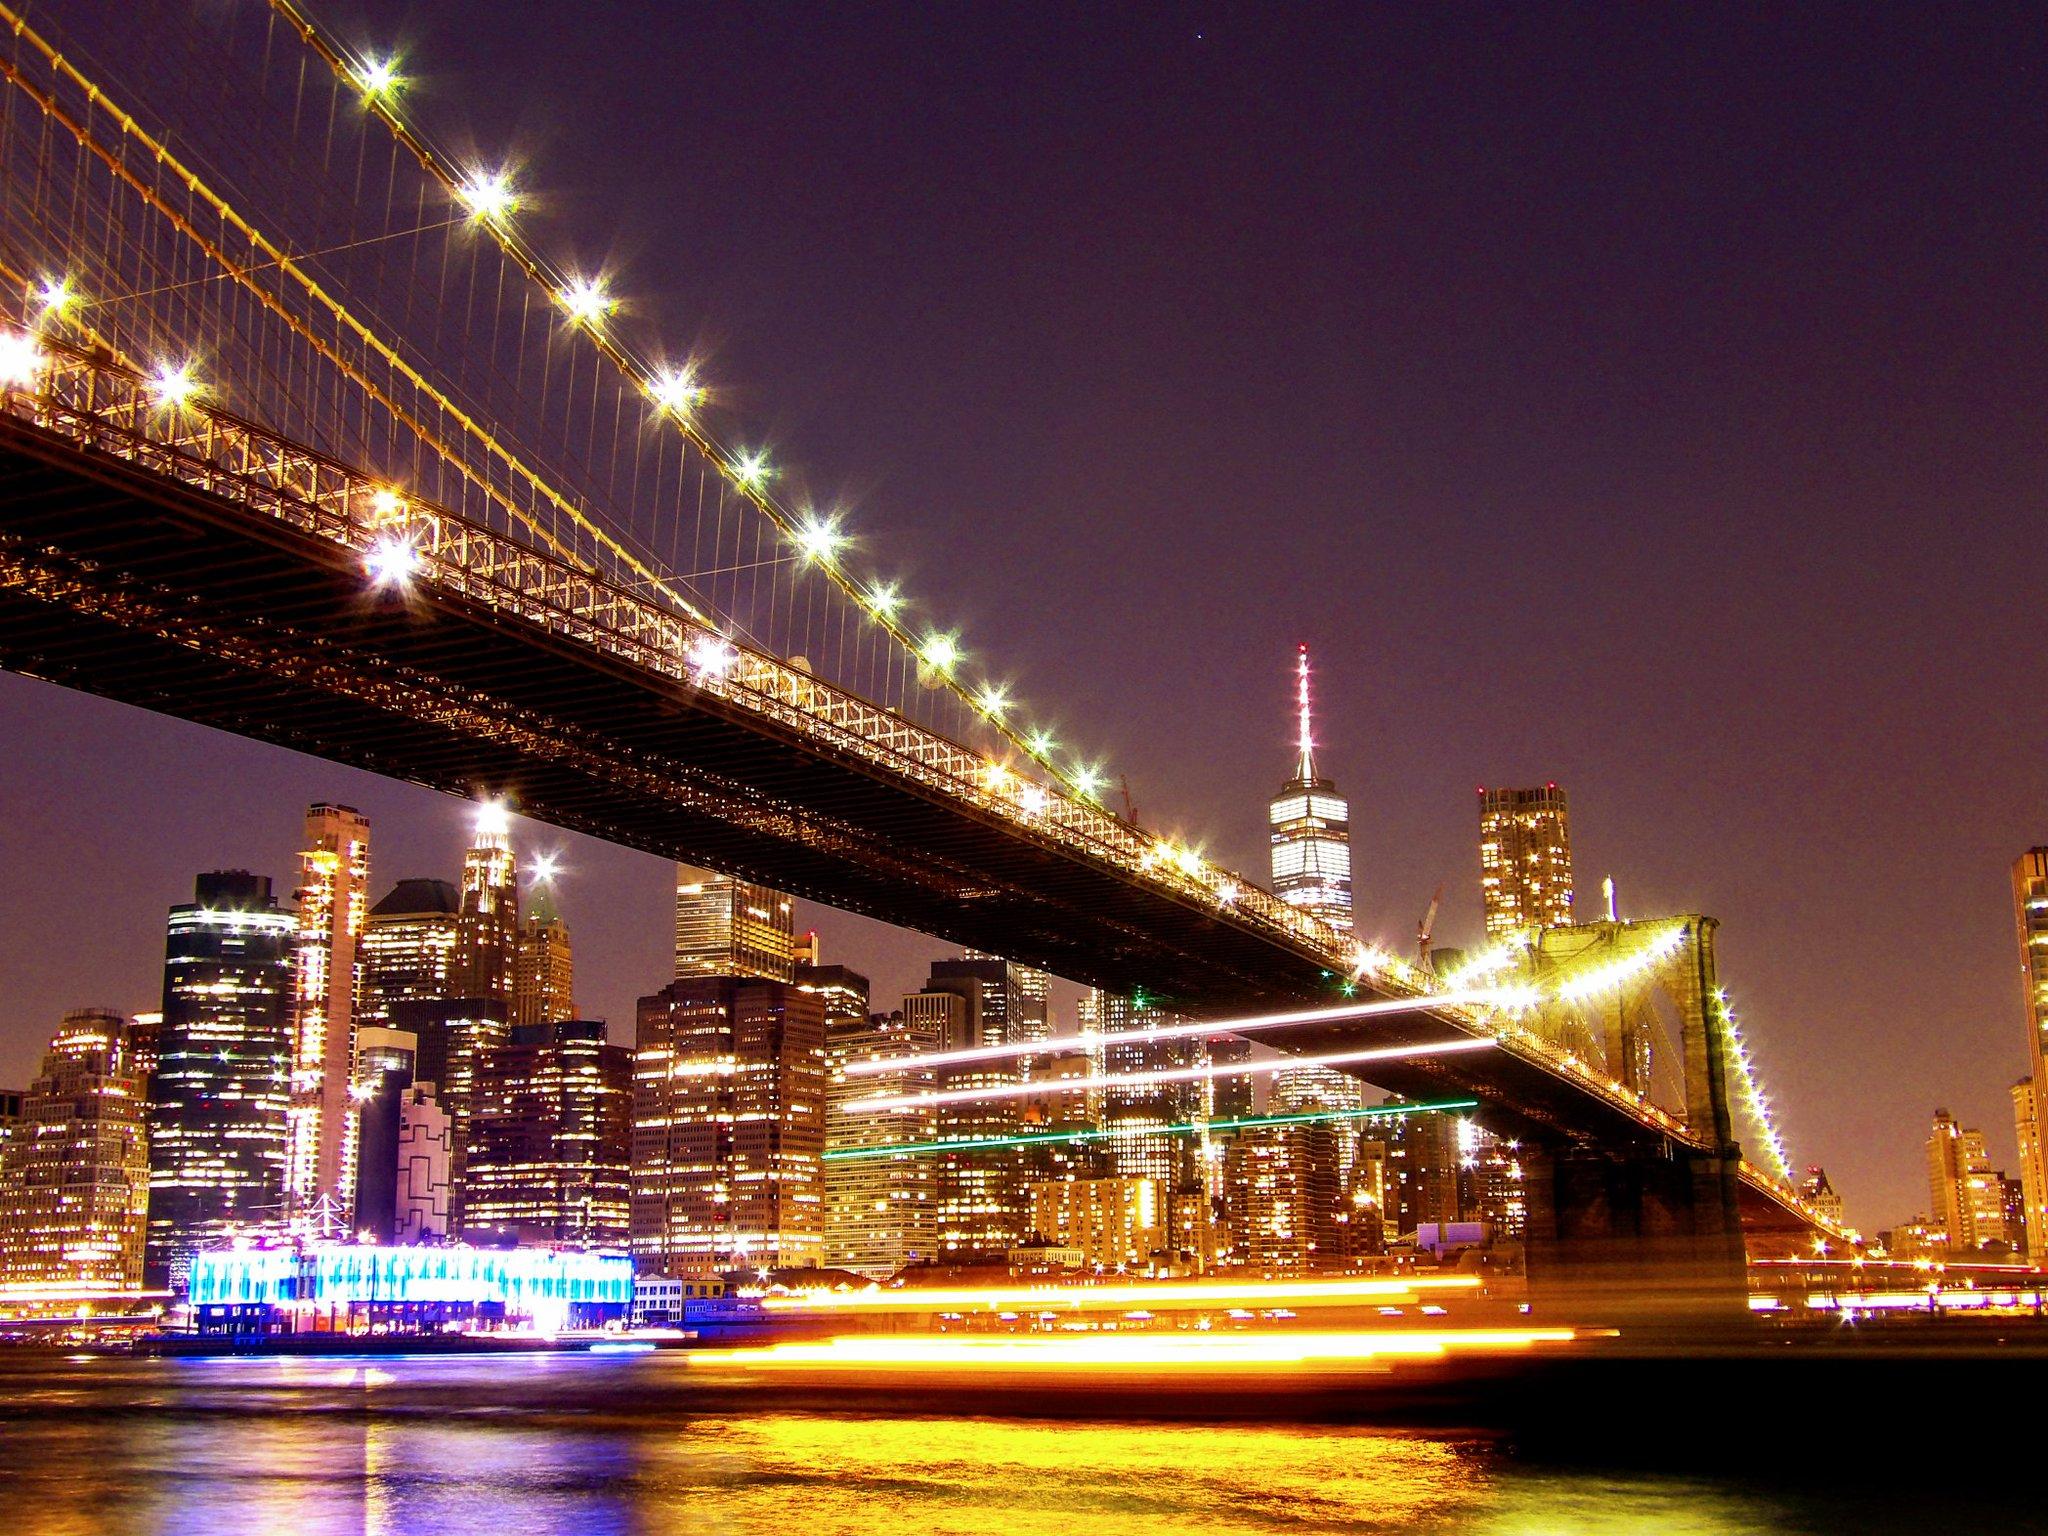 In a New York minute...#NYC #Longexposure 📷 #BrooklynBridge @nycfeelings @agreatbigcity #ThePhotoHour #stormhour @StormHourMark https://t.co/wOwhSJYGH4